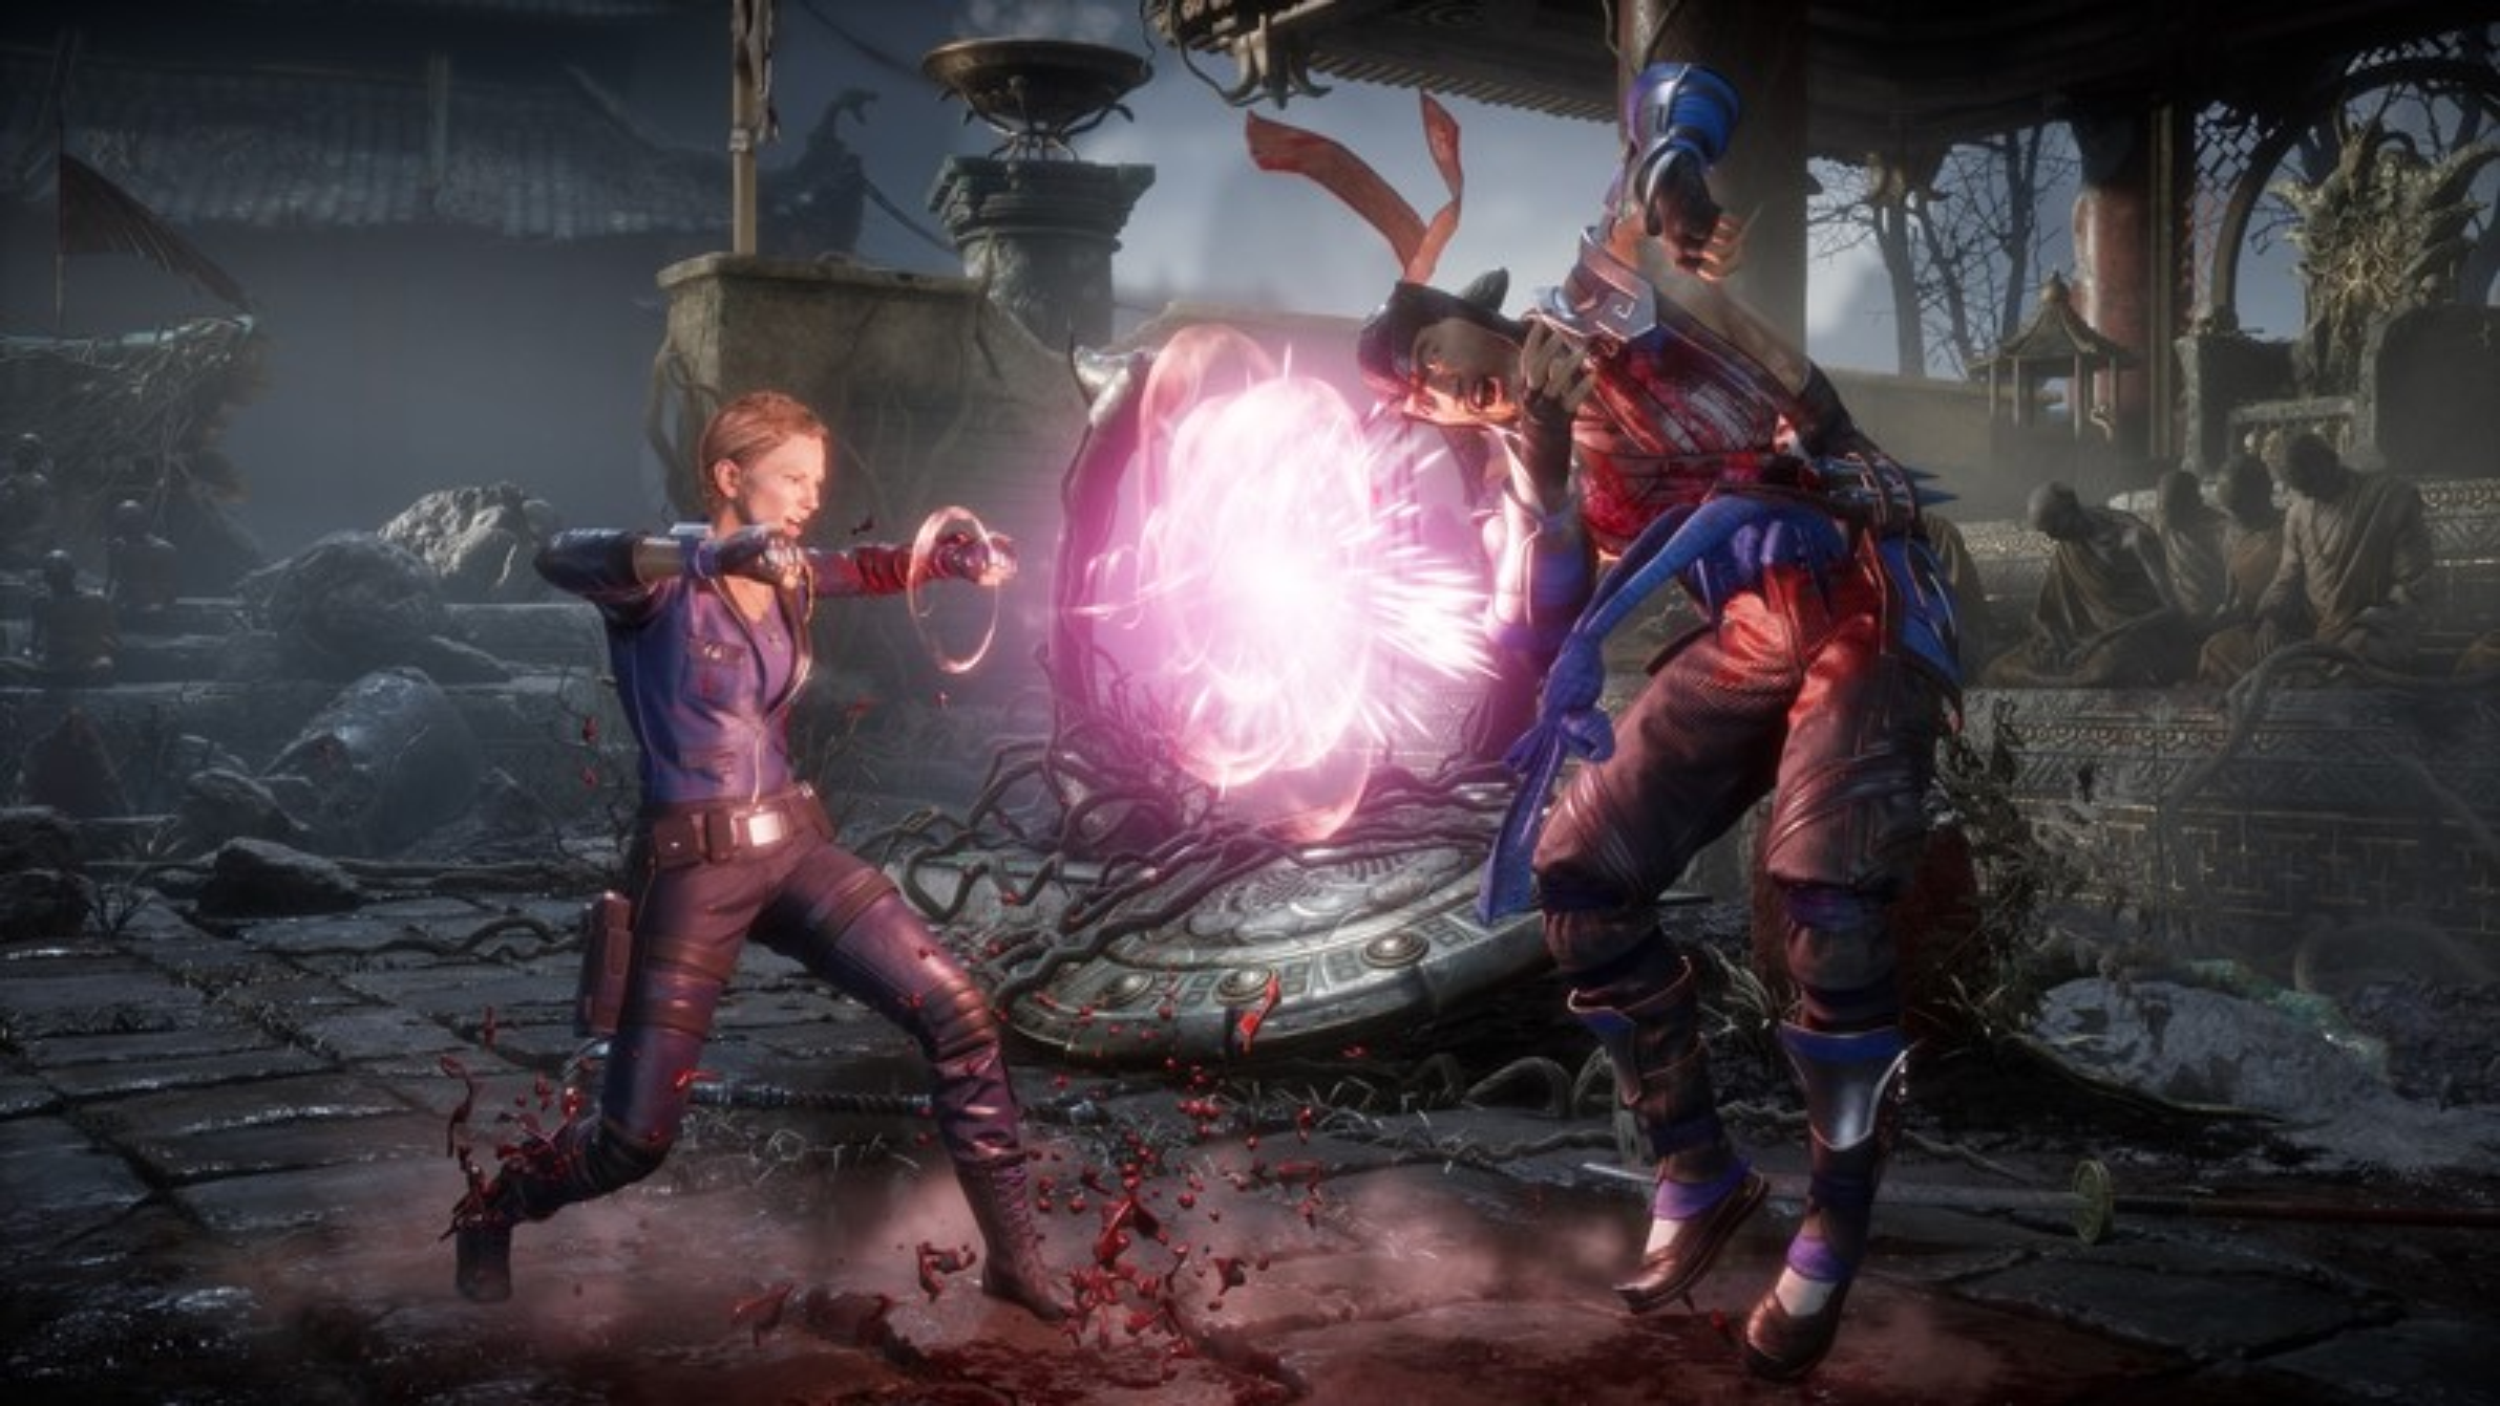 Mortal Kombat 11: tudo o que sabemos sobre o game (até agora)